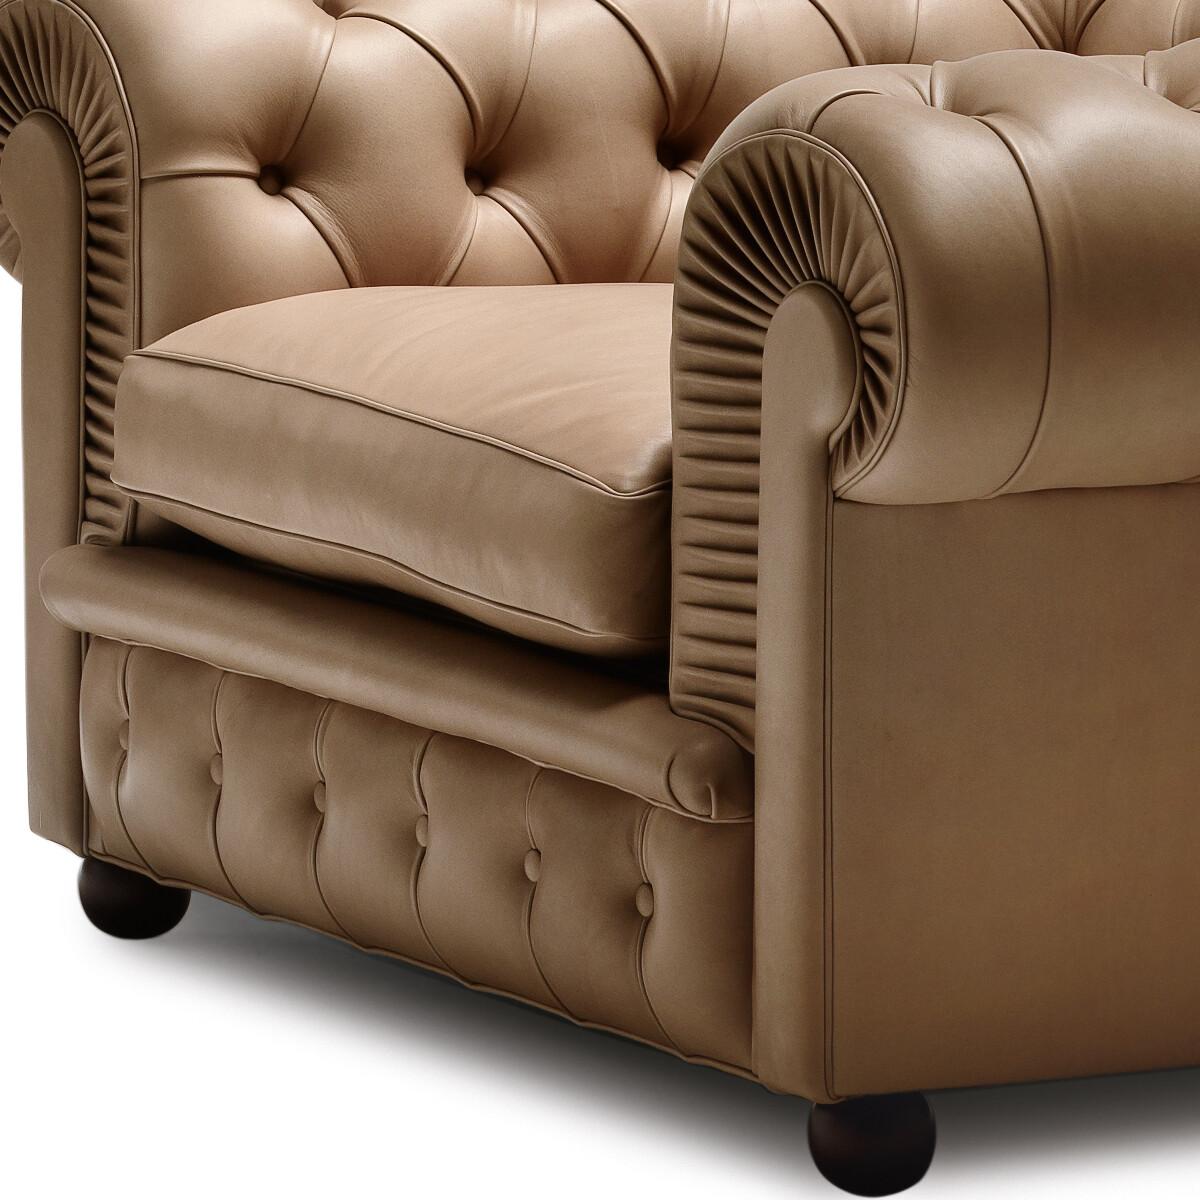 poltrona frau chester one sessel casa de. Black Bedroom Furniture Sets. Home Design Ideas